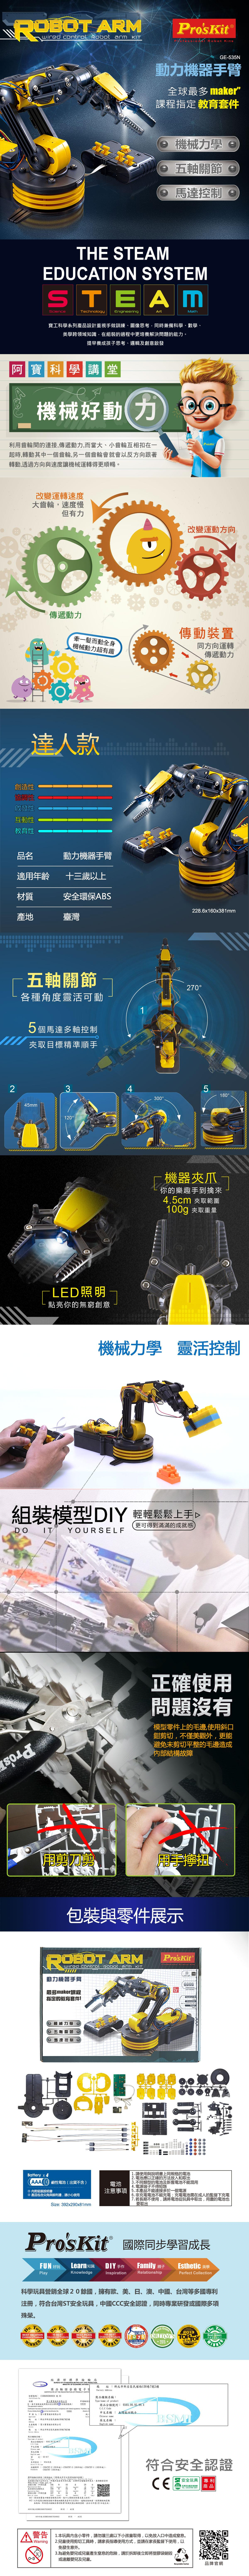 WIRED CONTROL ROBOT ARM&SOLAR ROVER機械手臂,全球最多課程指定教育套件,機械力學,五軸關節,馬達控制, 適用年齡13歲以上,各種角度靈活可動,機器夾爪4.5cm夾取範圍,100g夾取重量,LED照明設備.